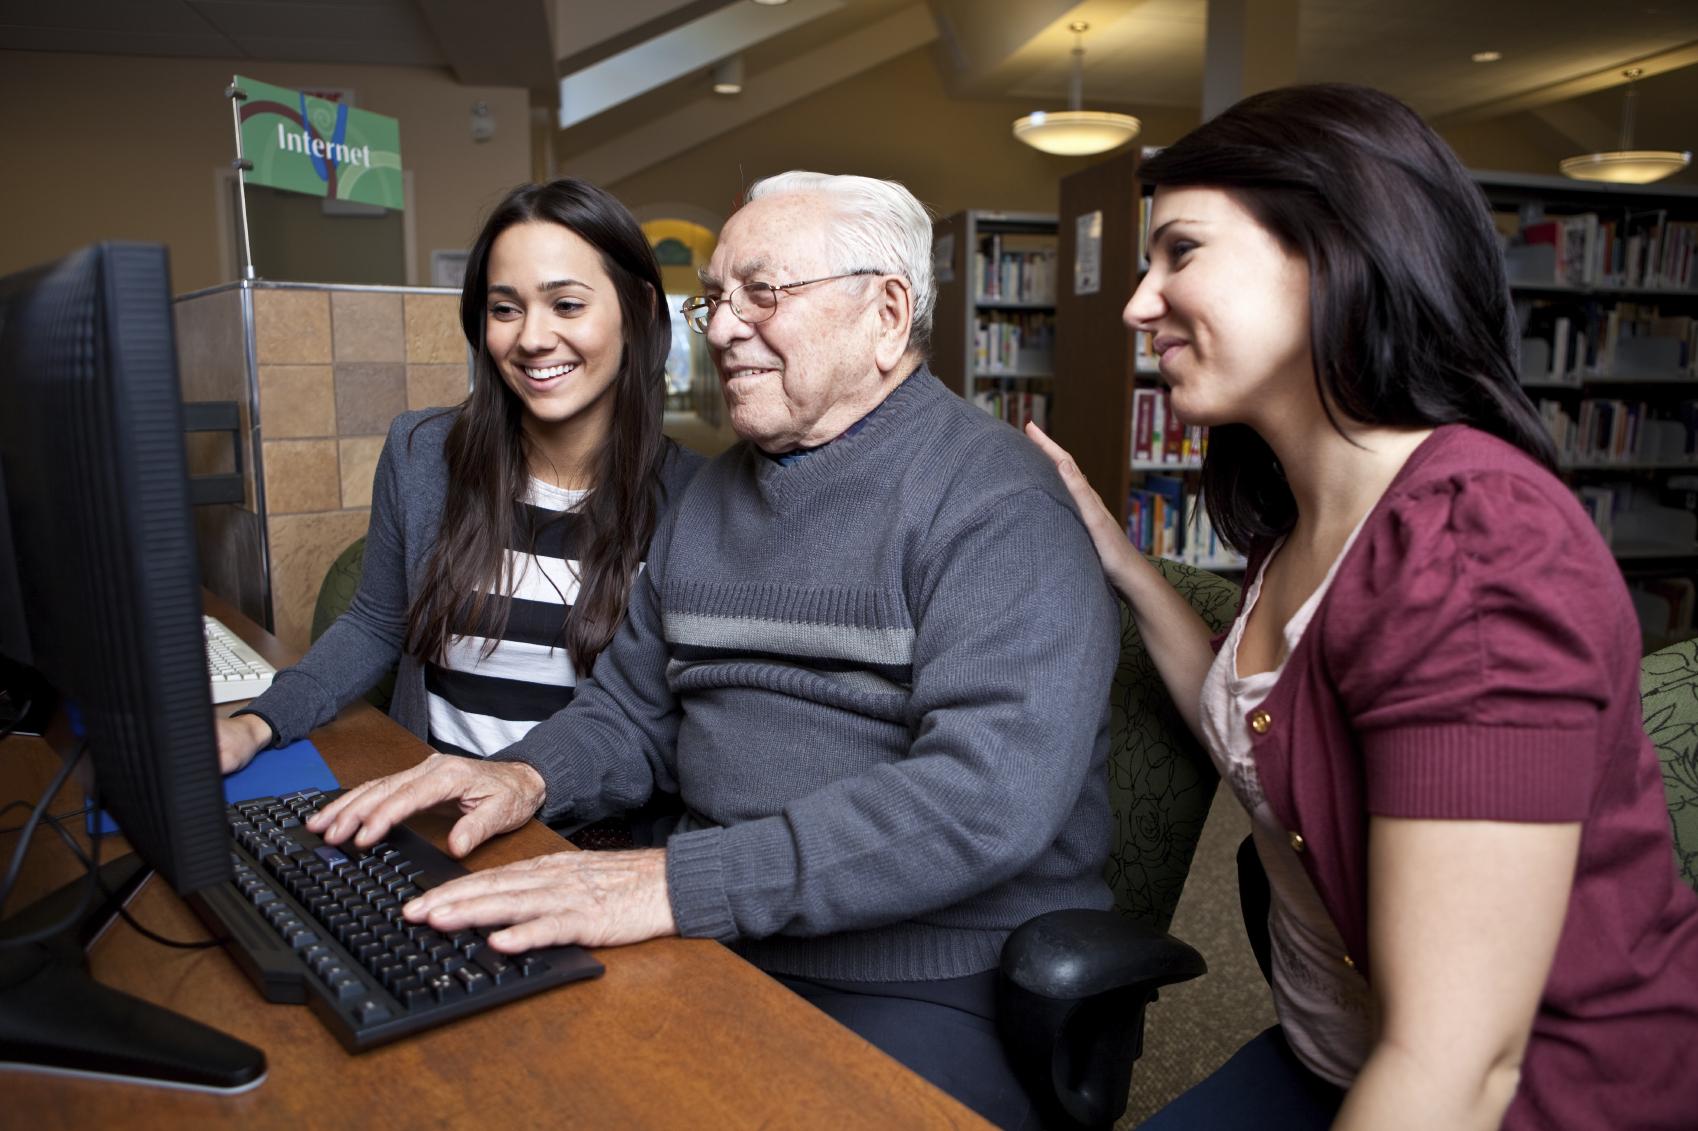 Tech-Savvy Students Volunteering